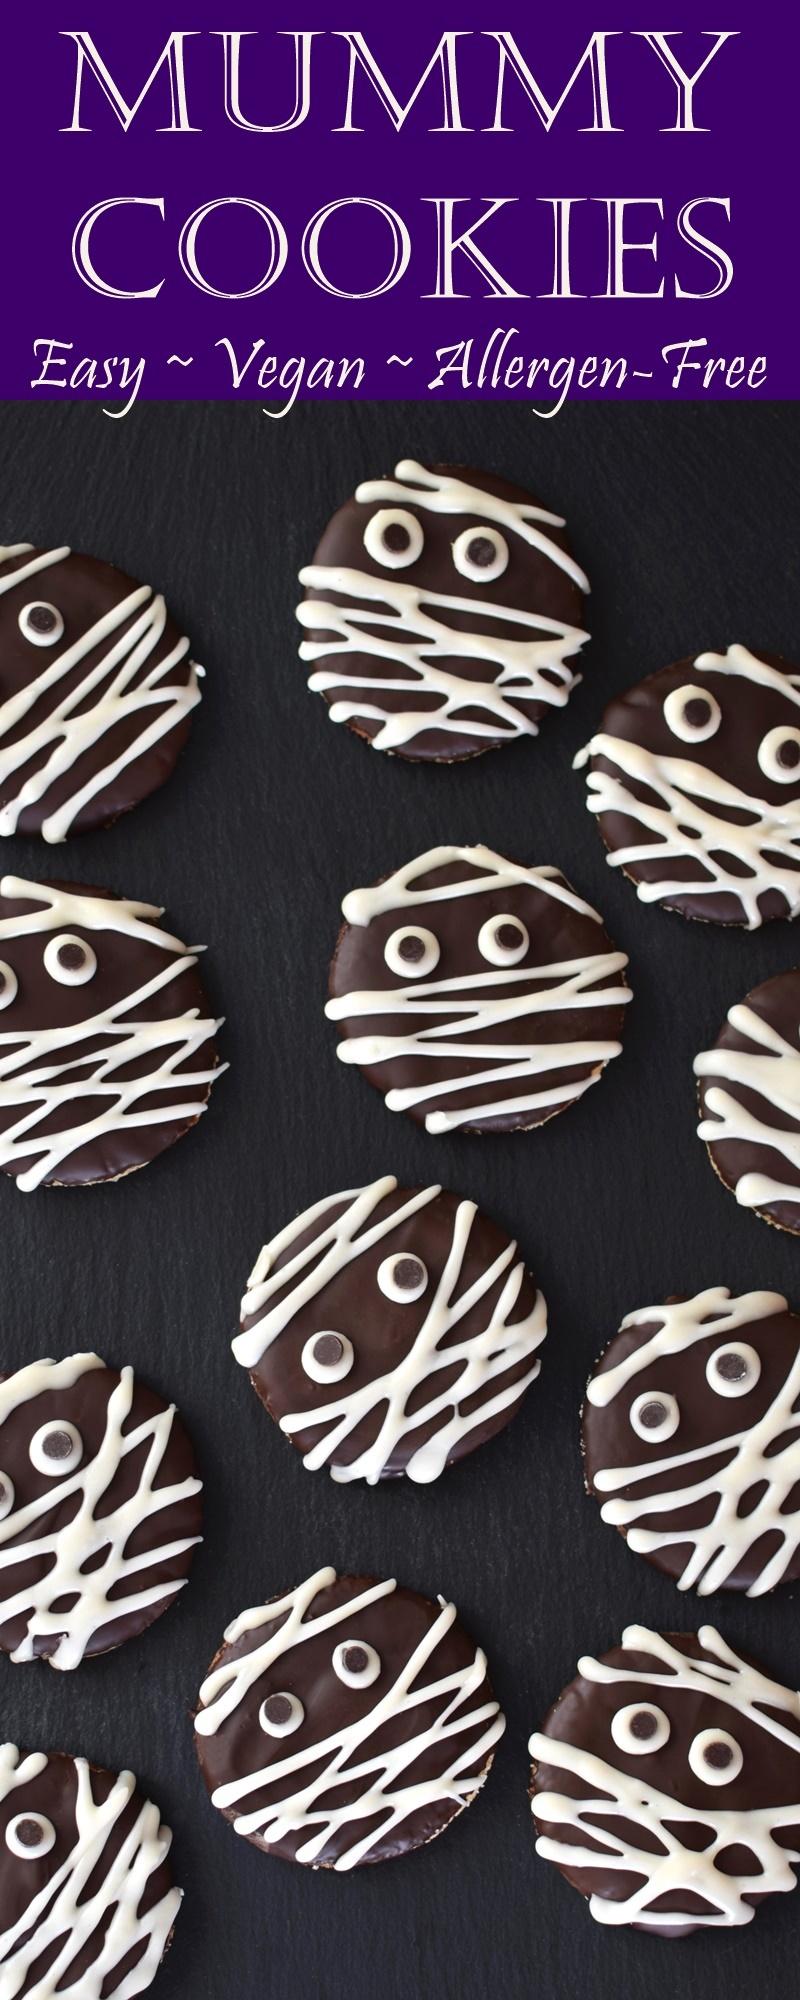 Mummy Cookies Recipe - Super Easy! Made dairy-free, gluten-free, vegan & allergy-friendly